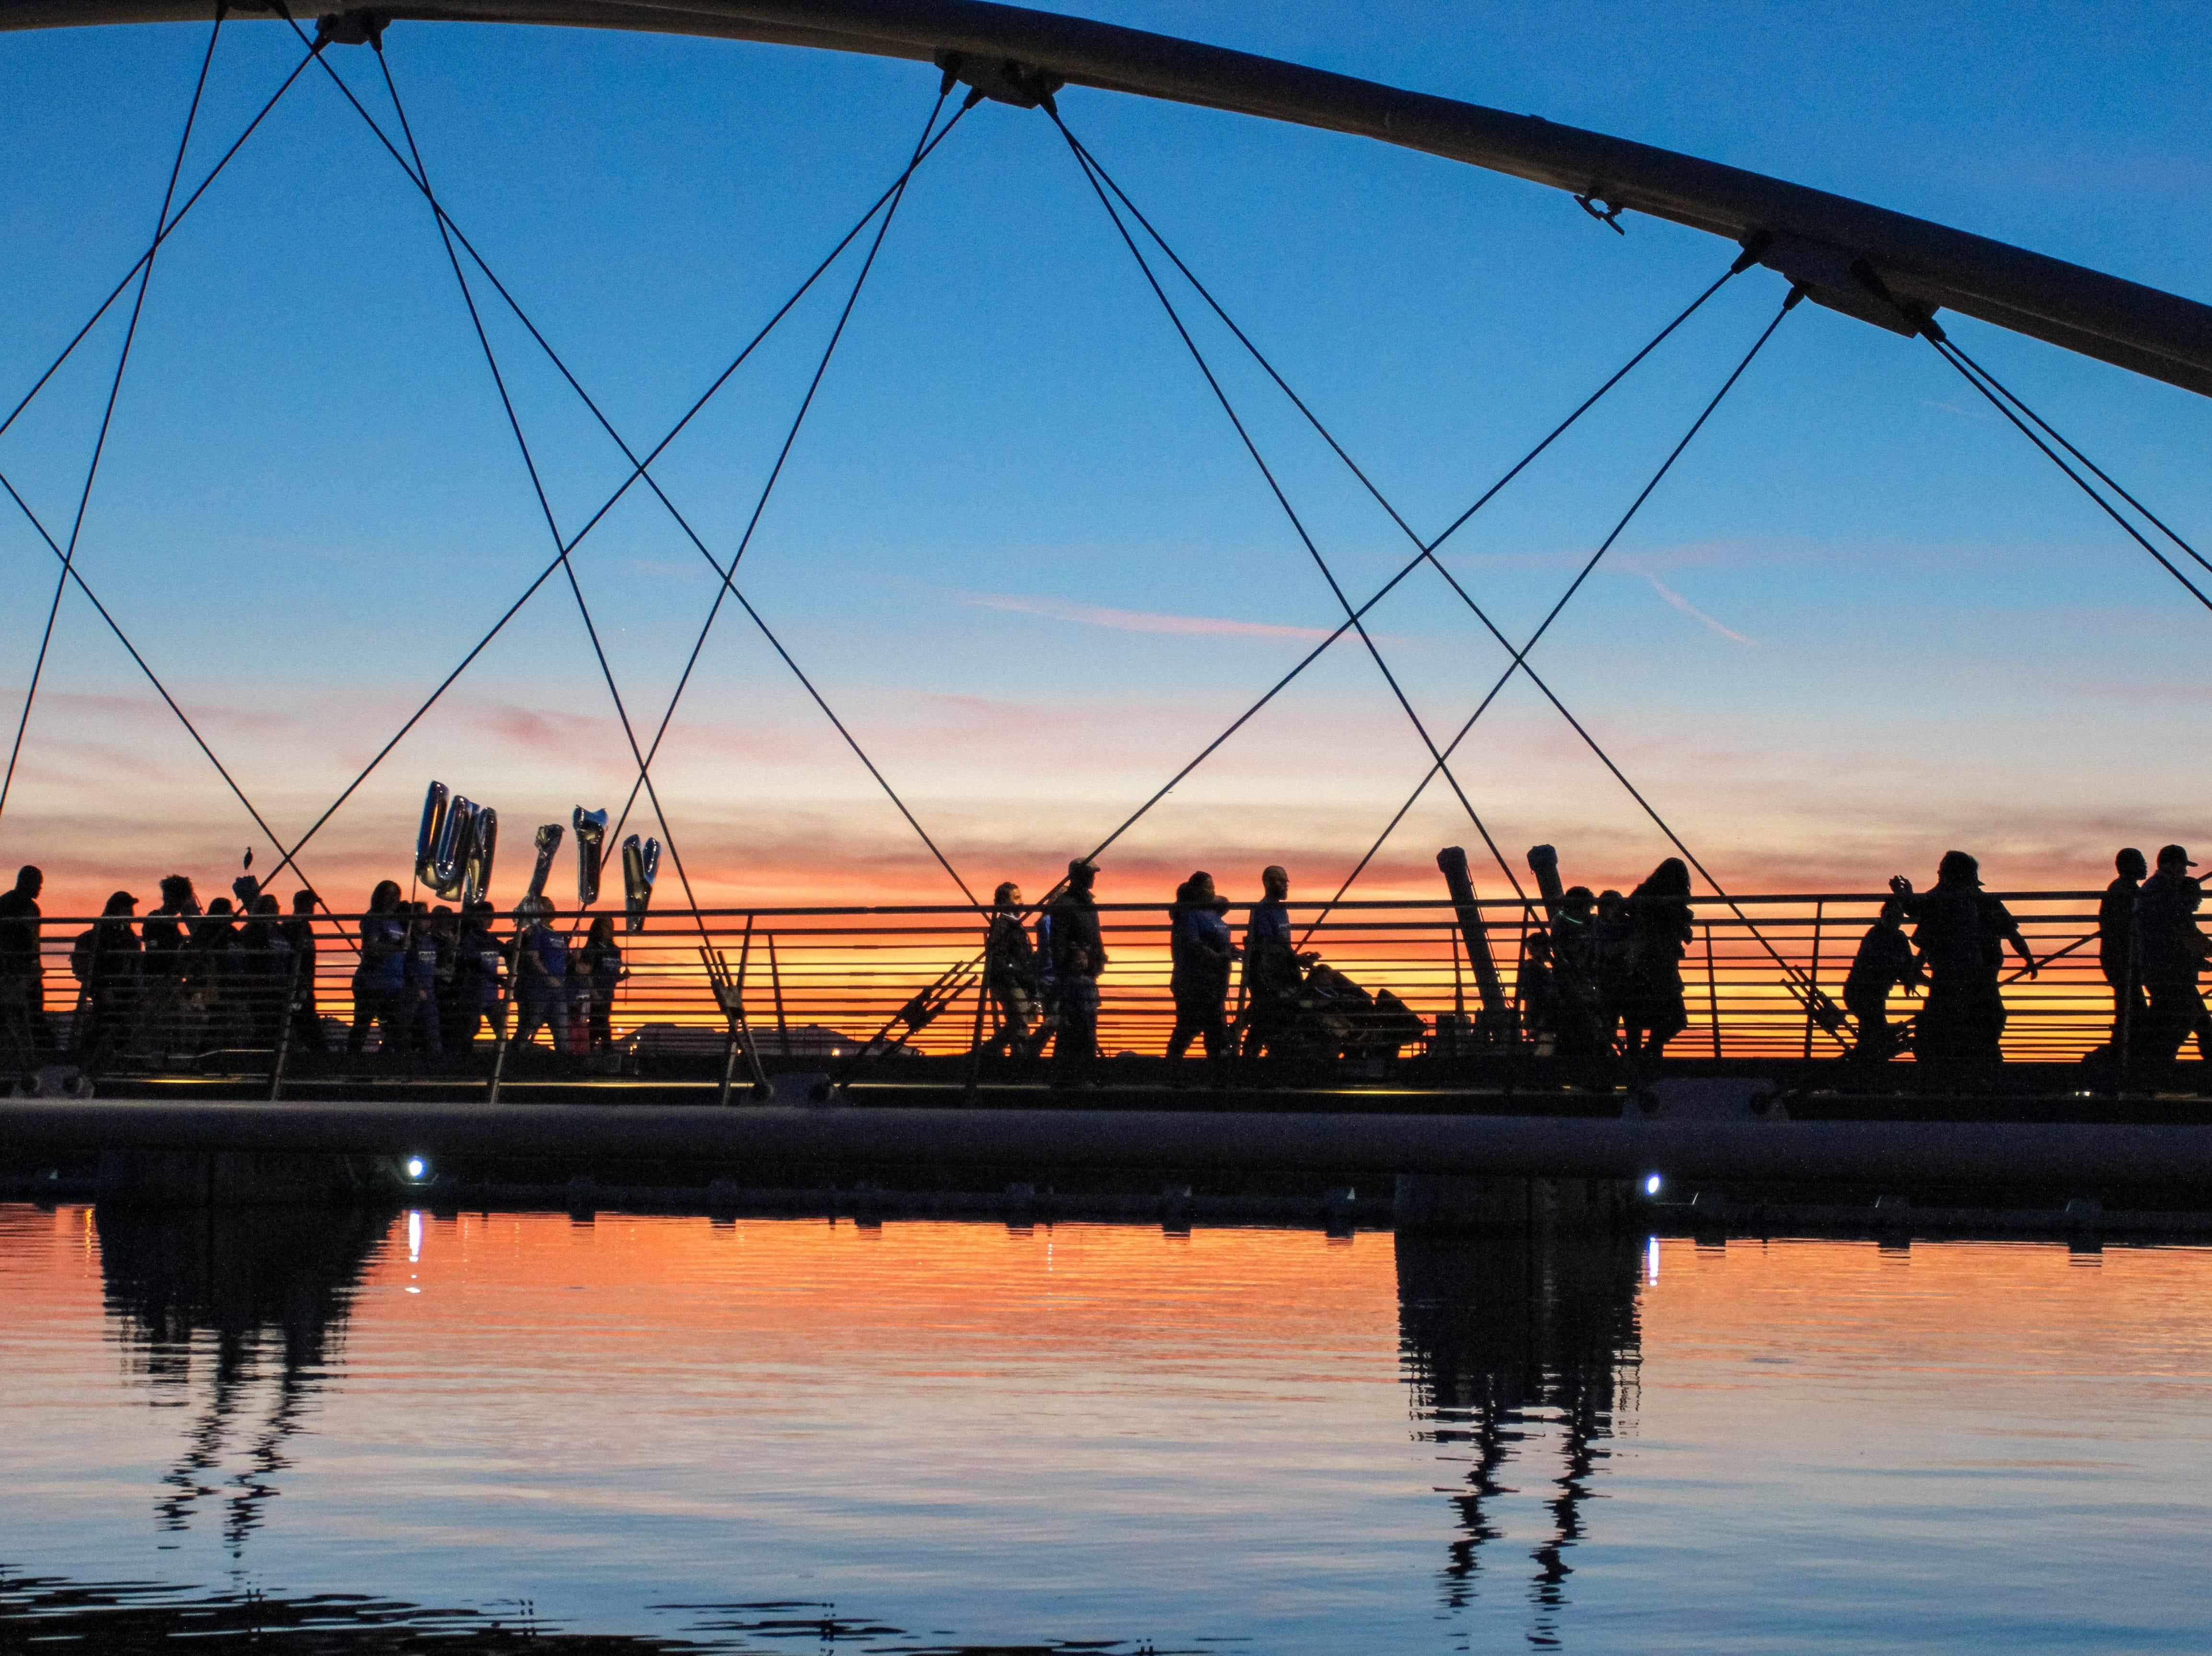 Participants walk over the Elmore Pedestrian Bridge at the Unity Walk 2019 at Tempe Beach Park, in Tempe, Arizona on Saturday, Jan. 26, 2019.